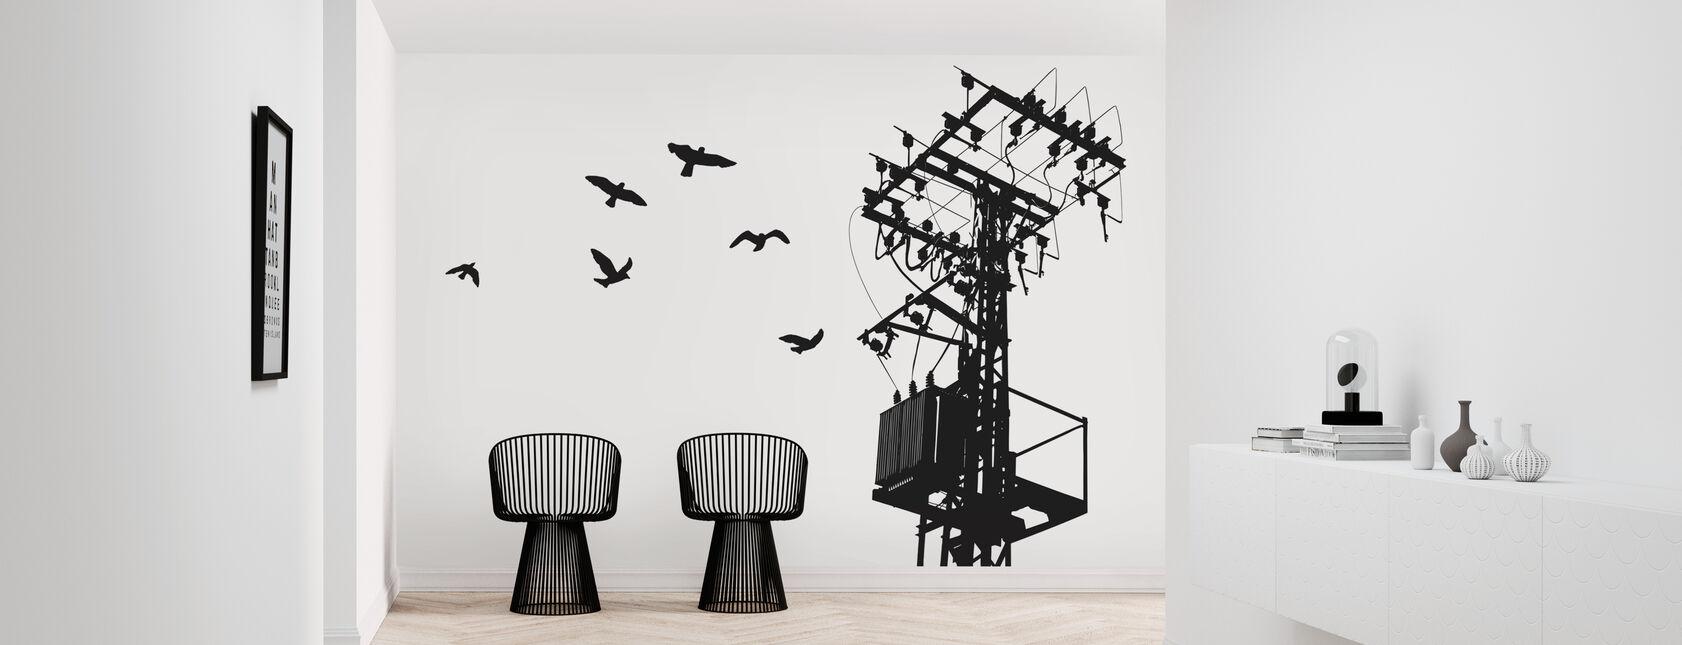 Powerline - Black and White - Papel pintado - Corredor